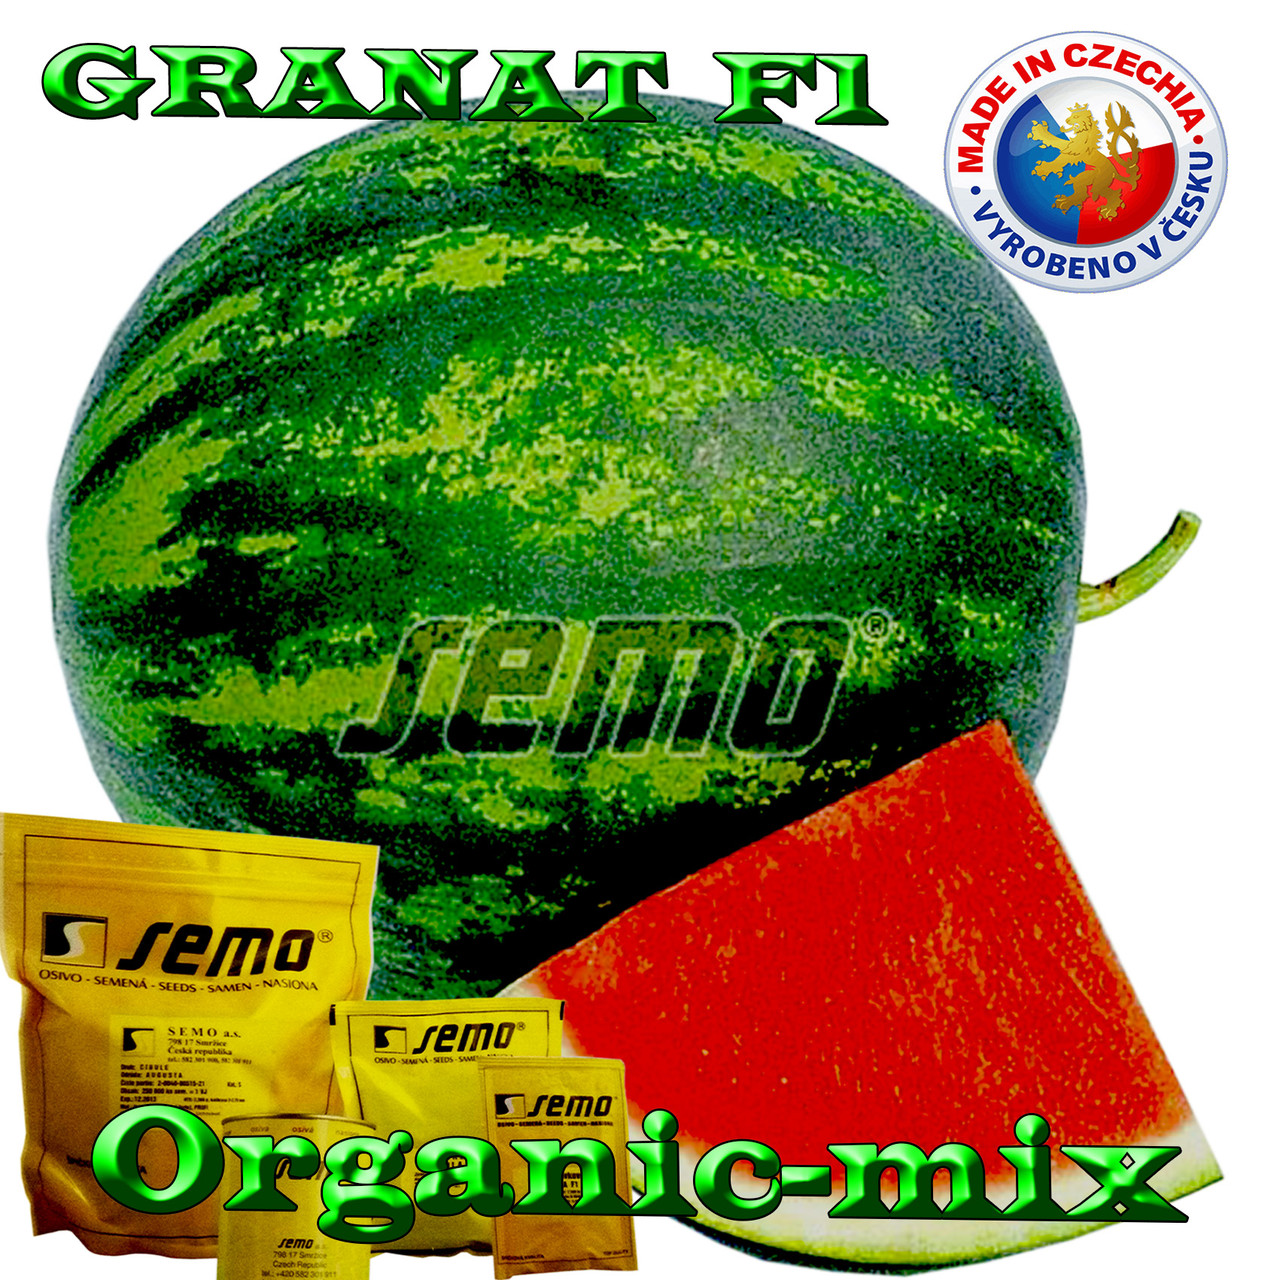 Арбуз бессемянный, ГРАНАТ F1 / GRANAT F1, ТМ SEMO (Чехия) пакет 10 грамм (ориентировочно 200 семян)